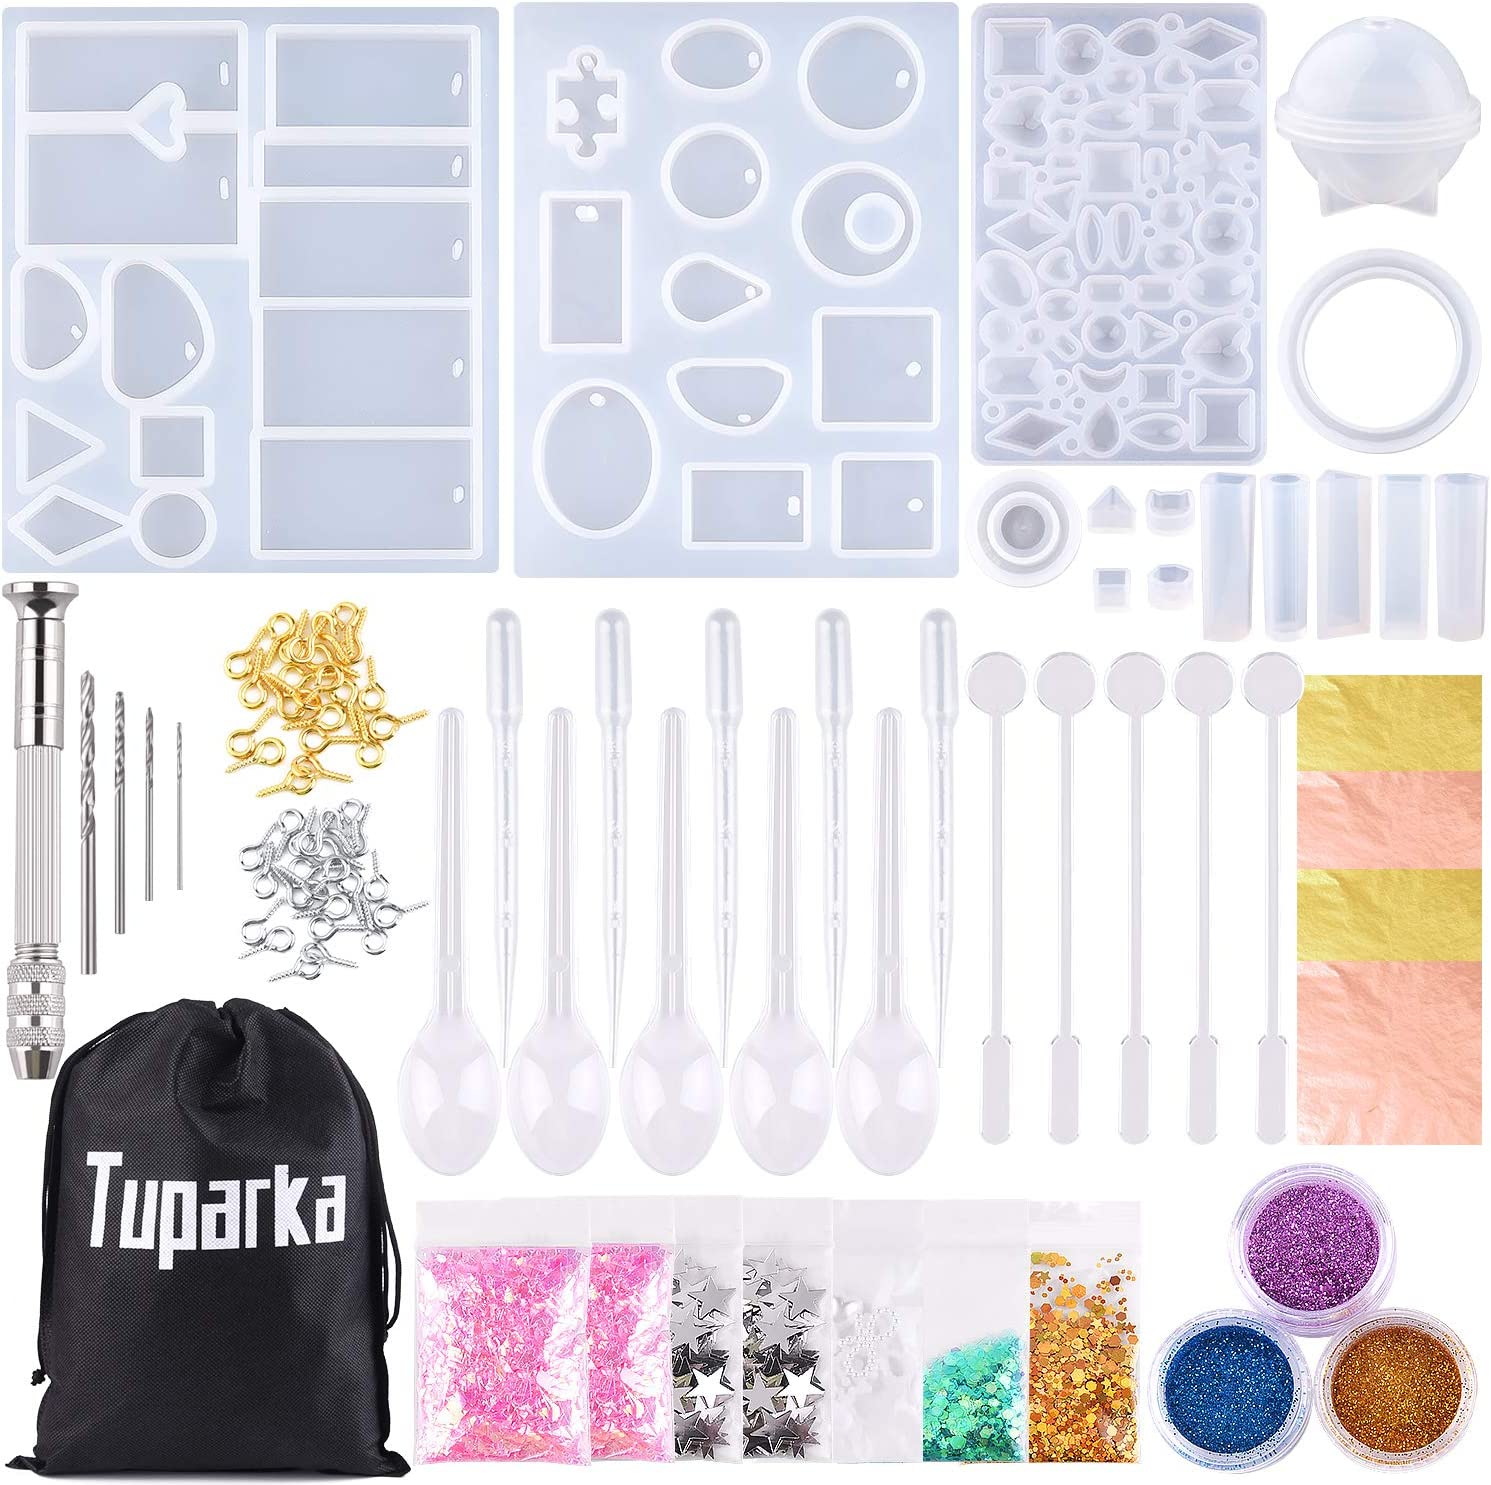 TUPARKA 165 PCSmolde silicona joyeria epoxi,Resina Moldes para hacer artesanías de joyería DIY,Collar Pendiente Fabricación